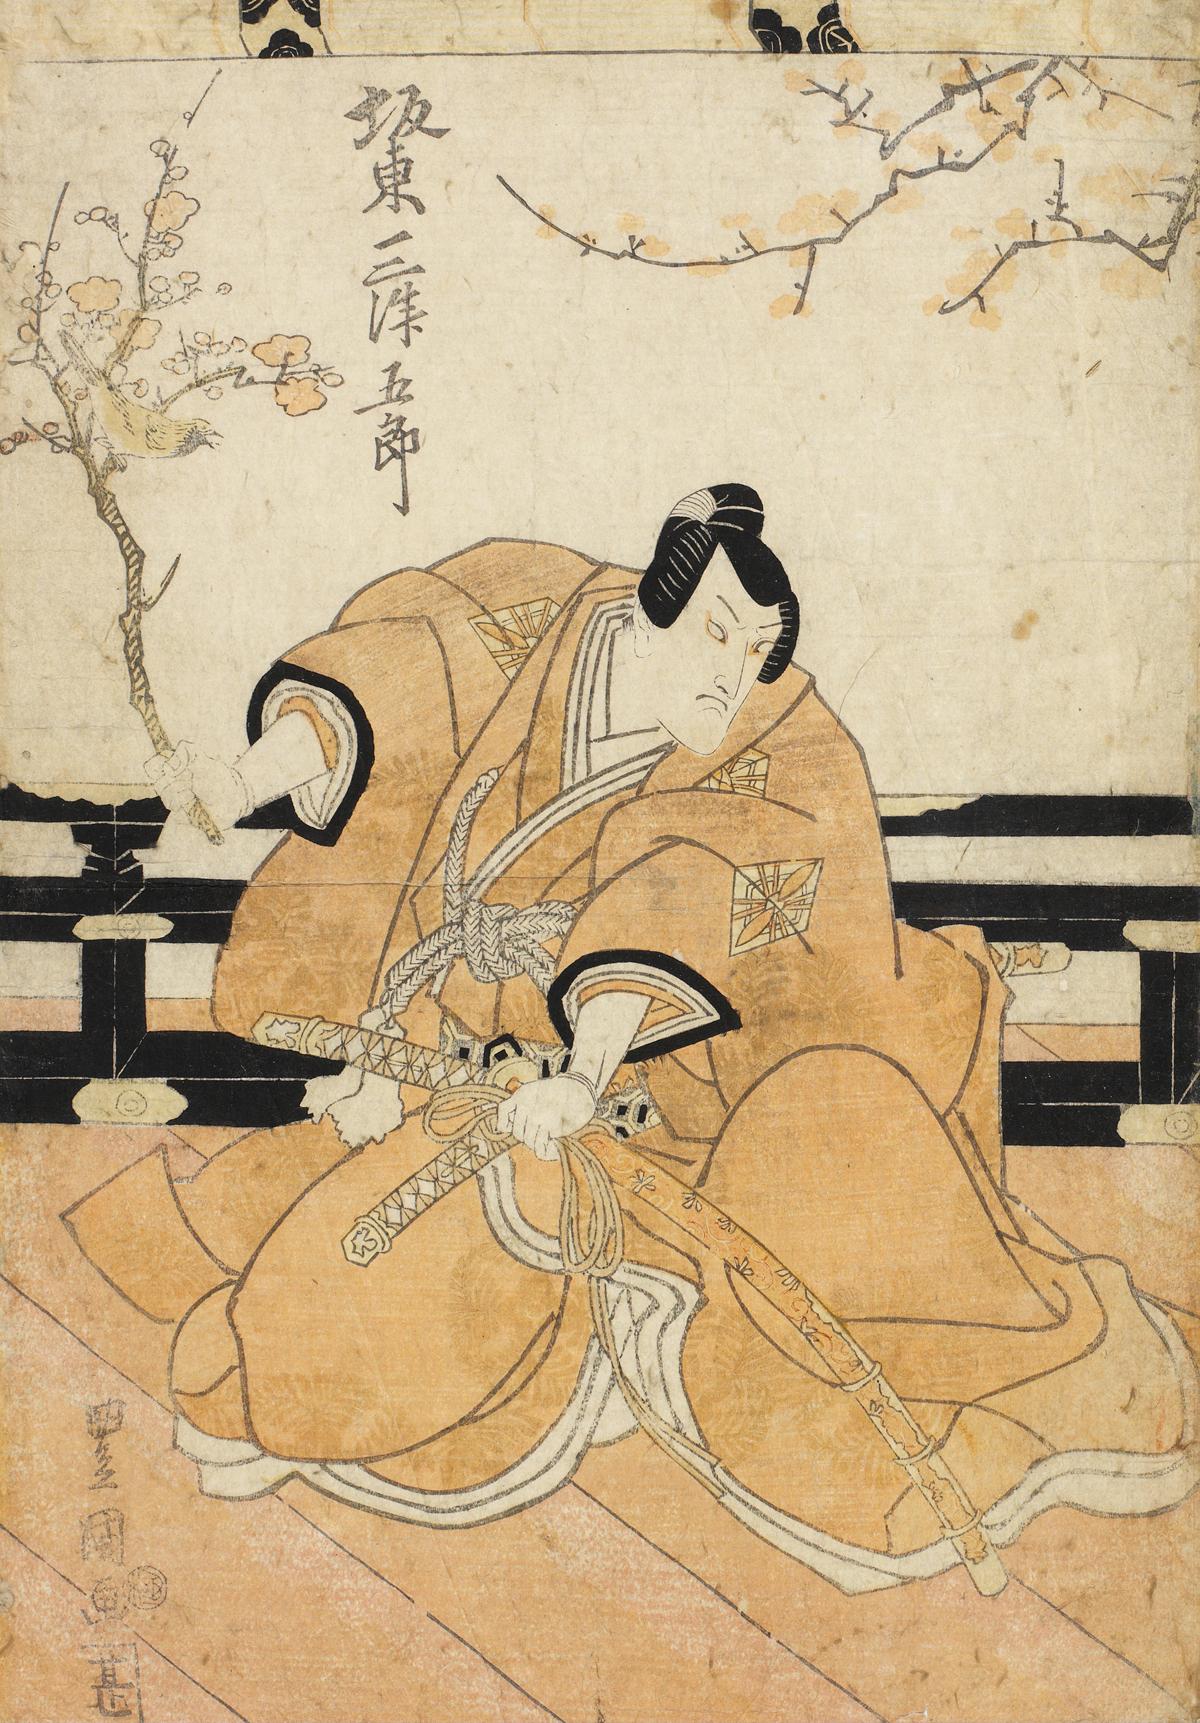 Actors 1815 Toyokuni Japanese Woodcut Prints Park West Gallery